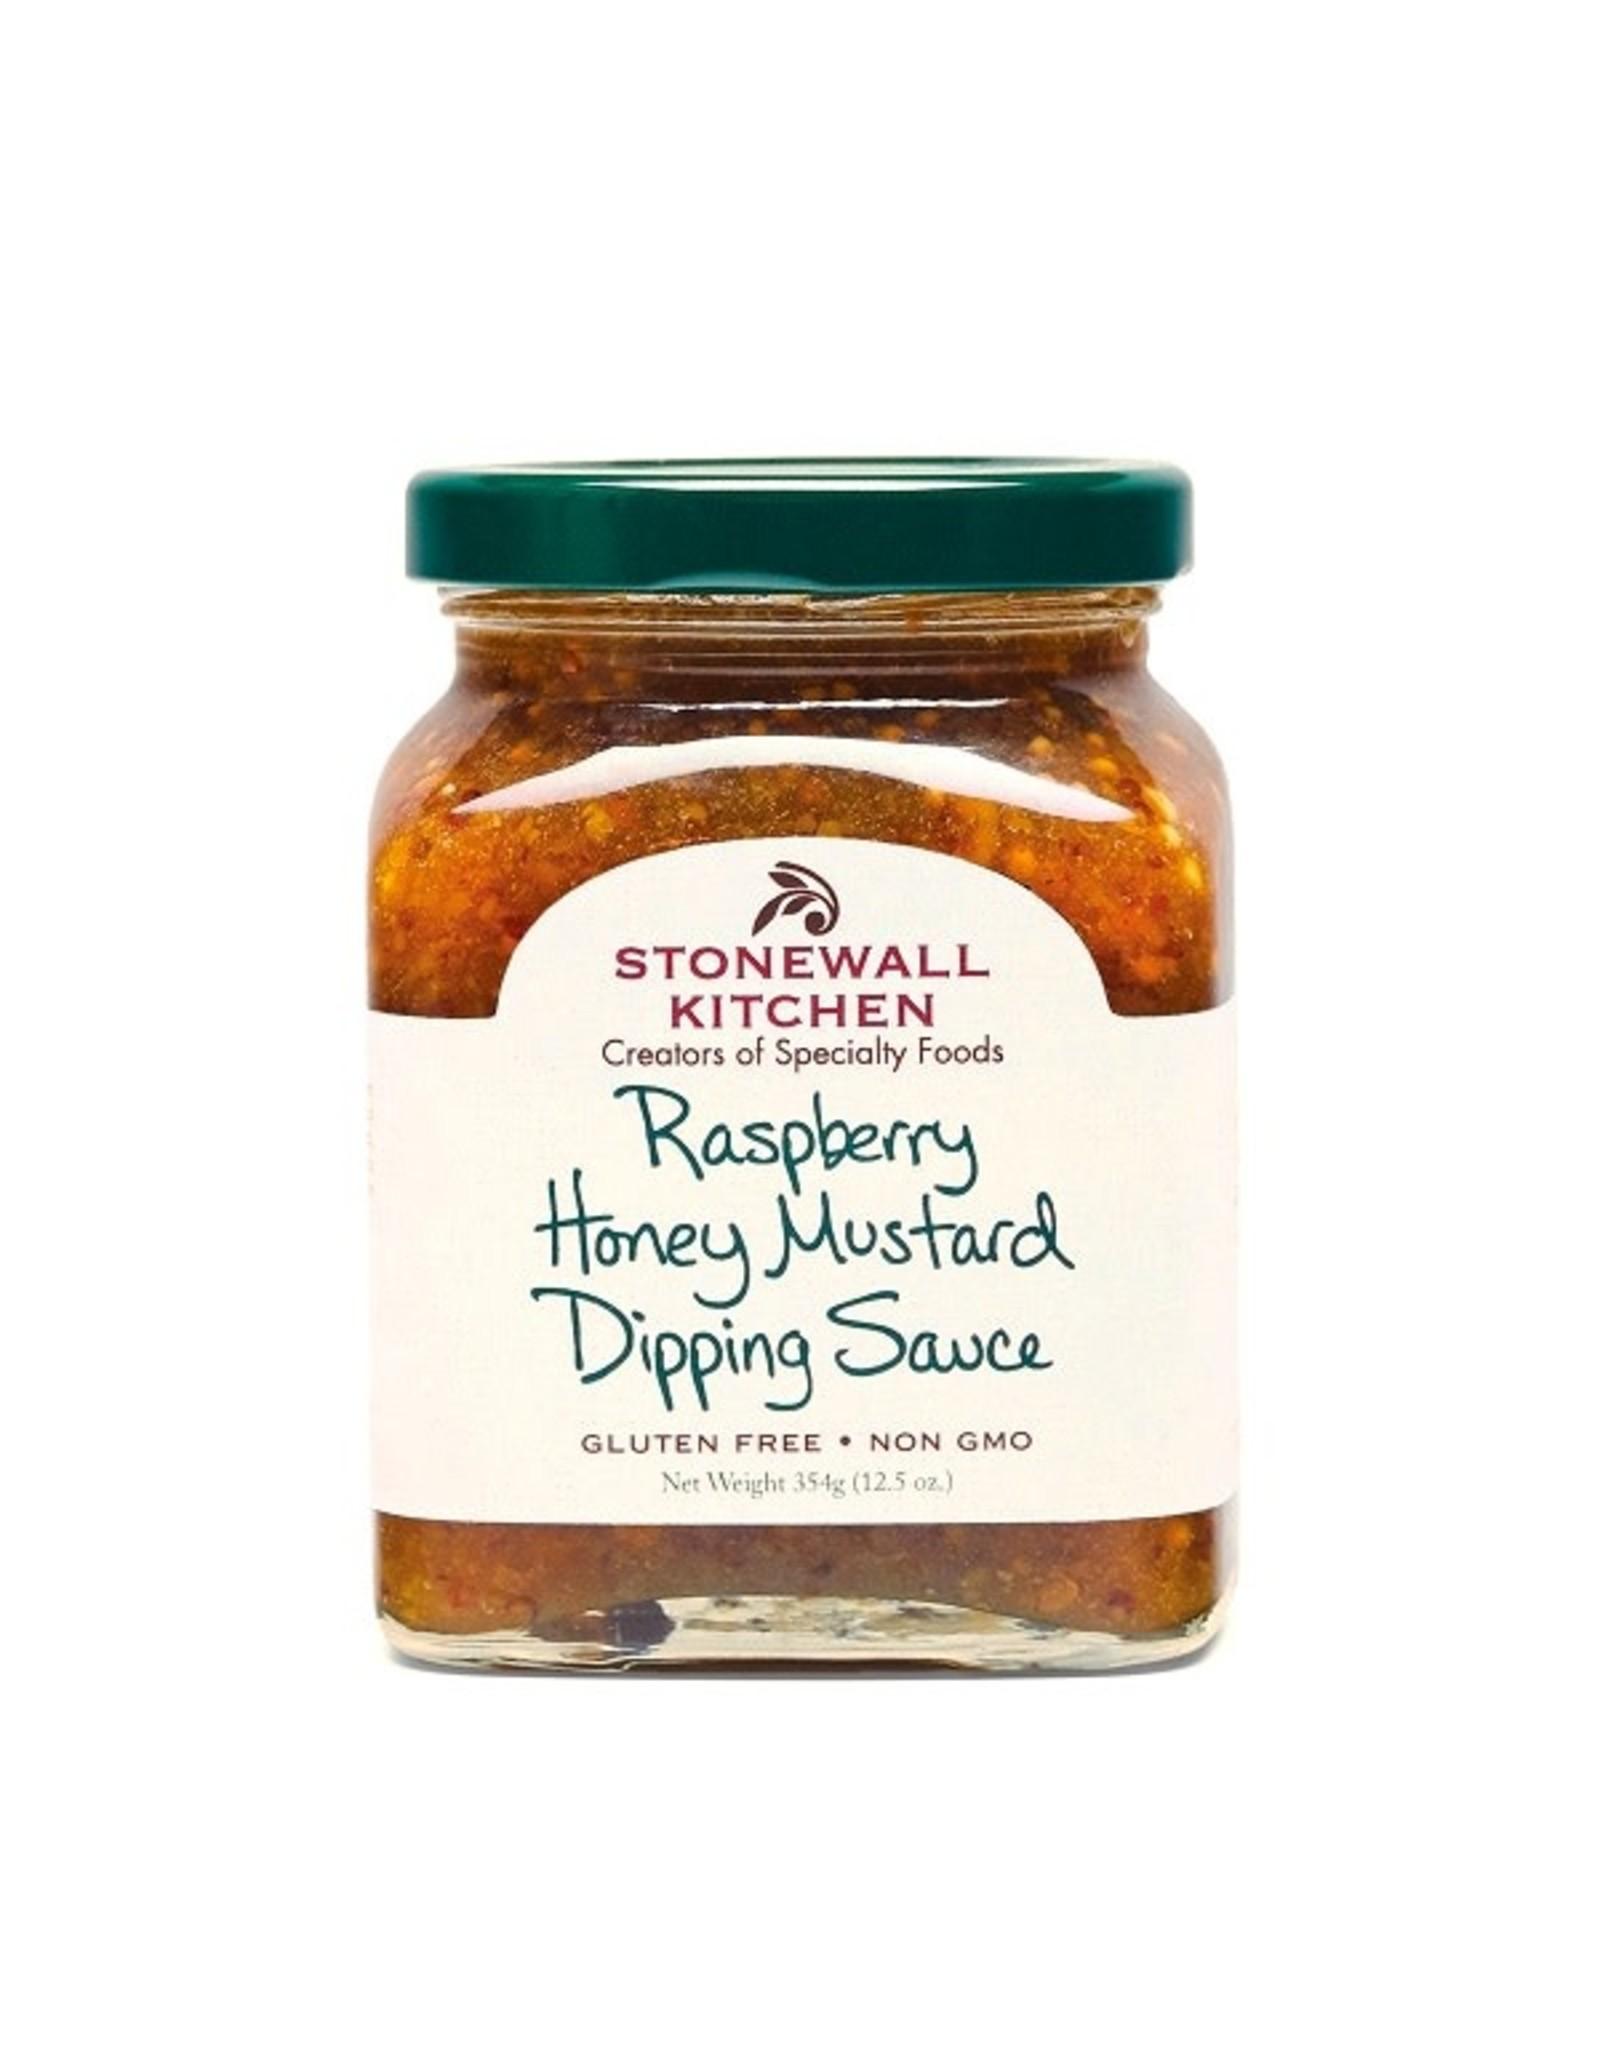 Stonewall Kitchen RASPBERRY HONEY MUSTARD DIPPING SAUCE